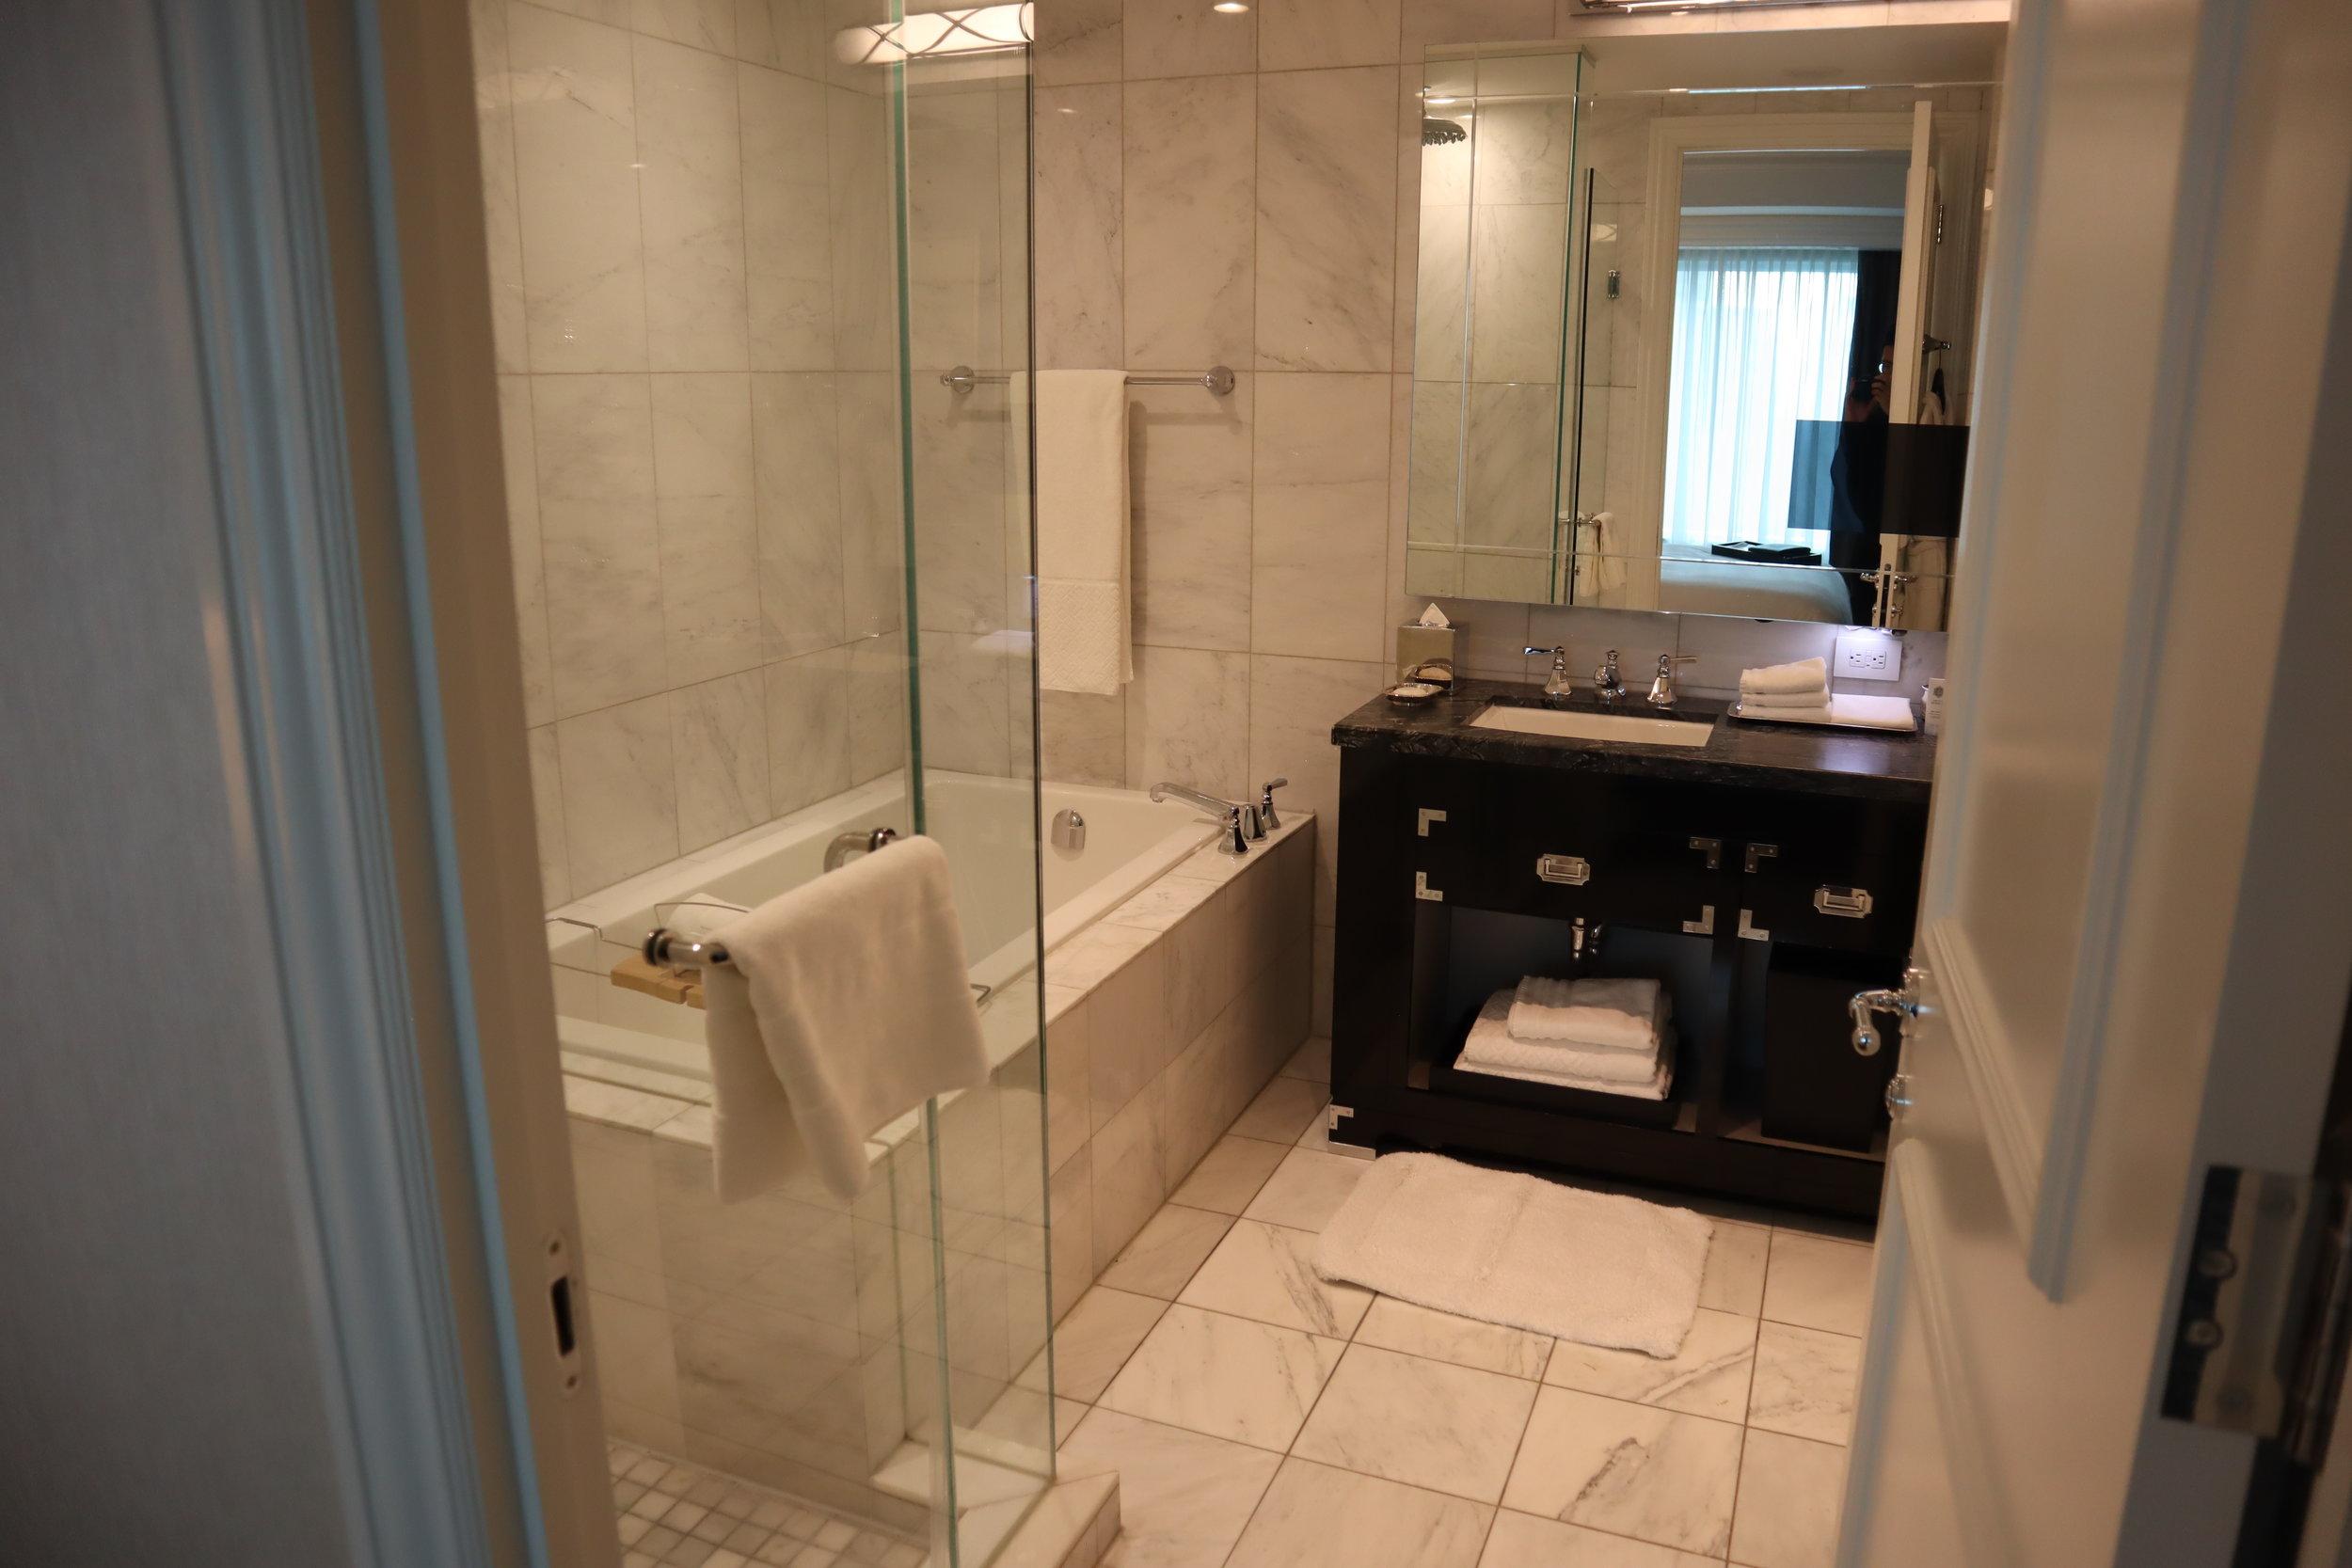 St. Regis Toronto – Two-bedroom suite master bathroom